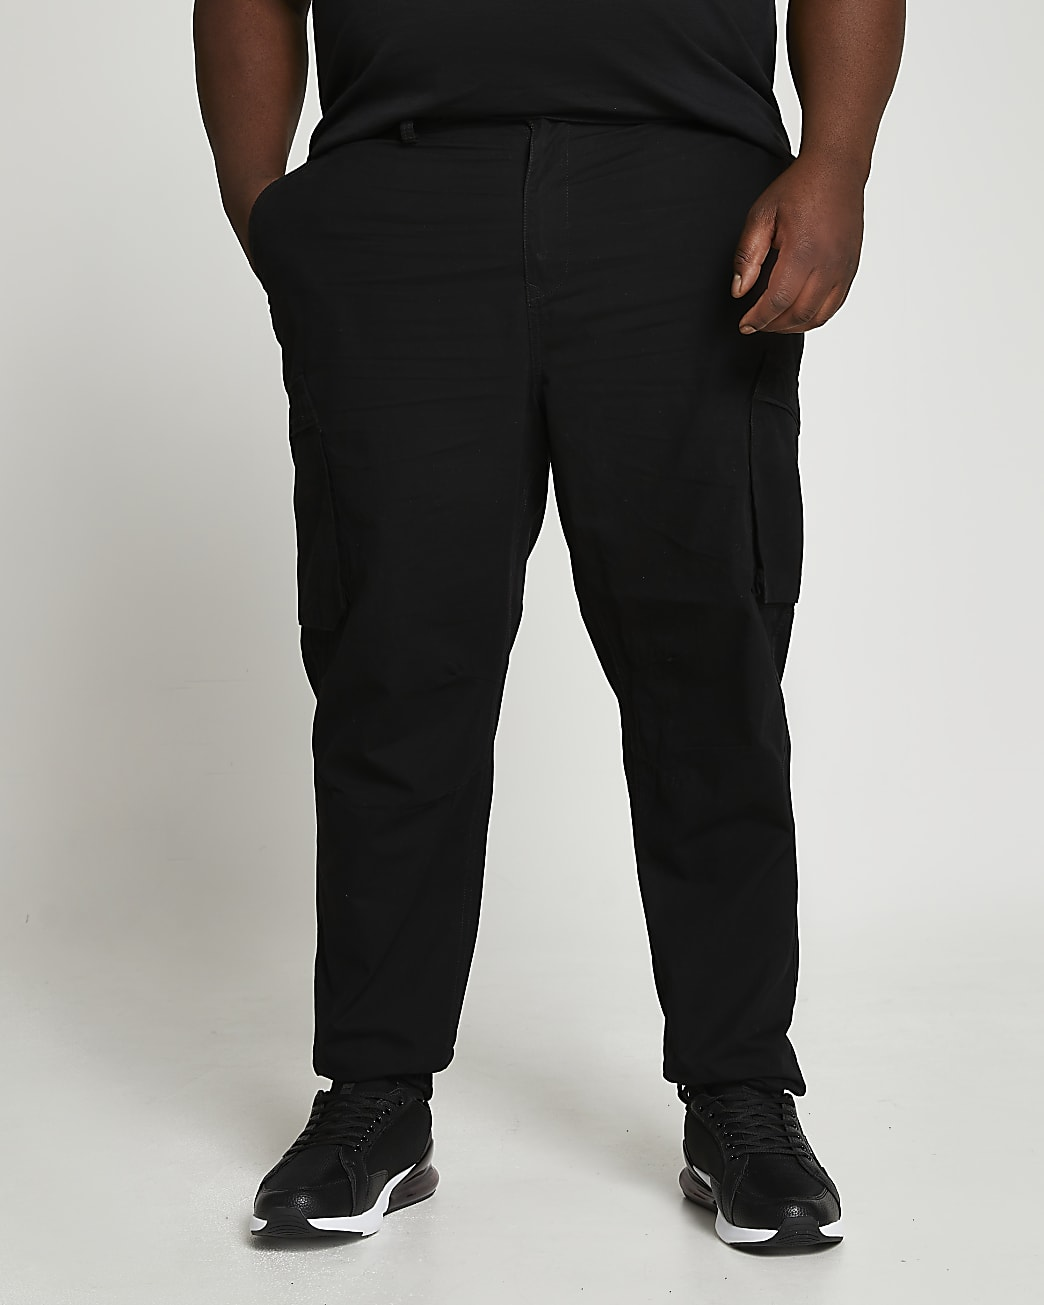 Big & Tall black utility trousers